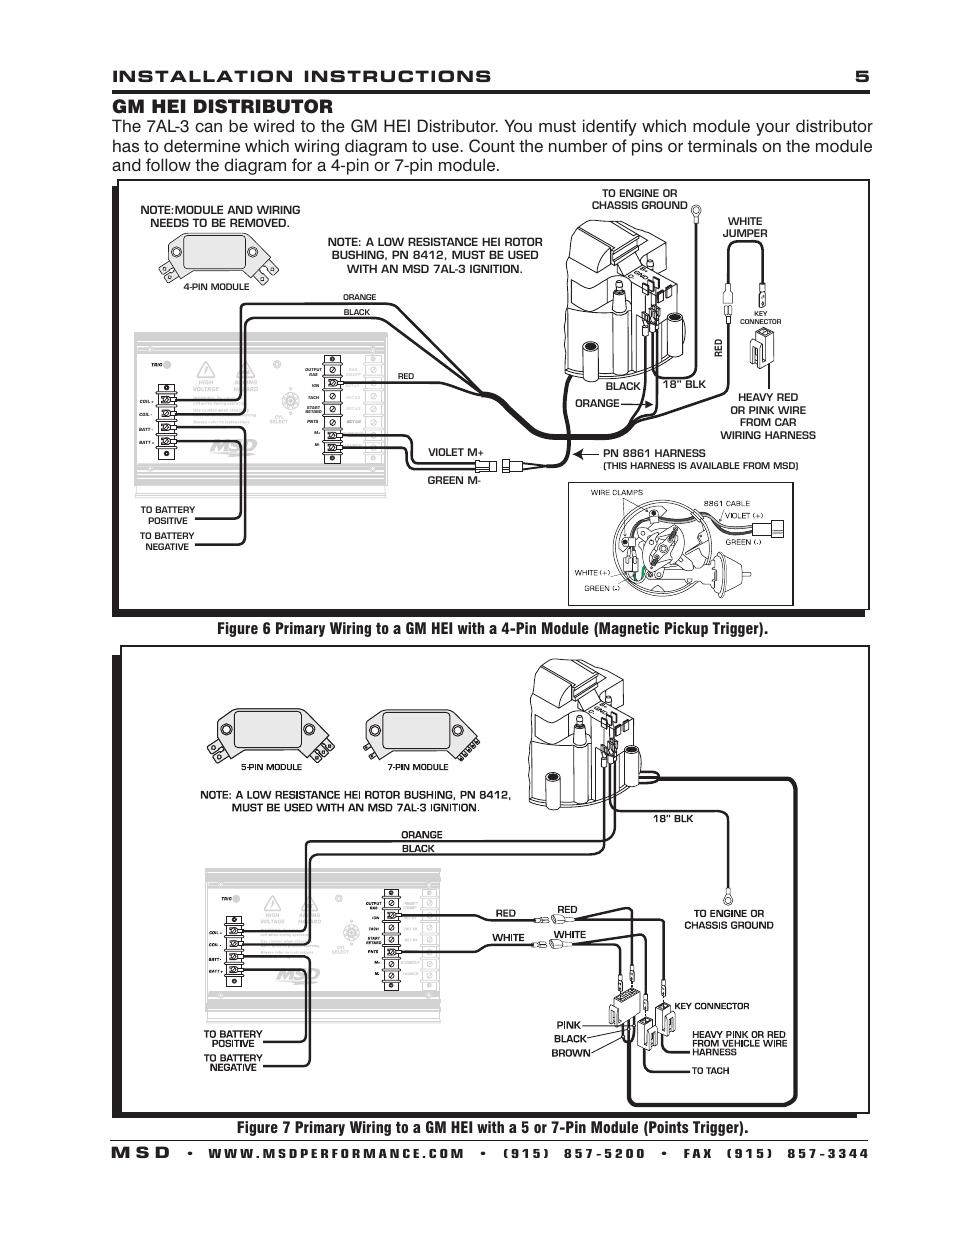 msd 7330 7al 3 ignition control installation page5?resize\\\\\\\=665%2C861 crane hi 6 wiring diagram crane cams hi 6 wiring diagram \u2022 wiring  at crackthecode.co